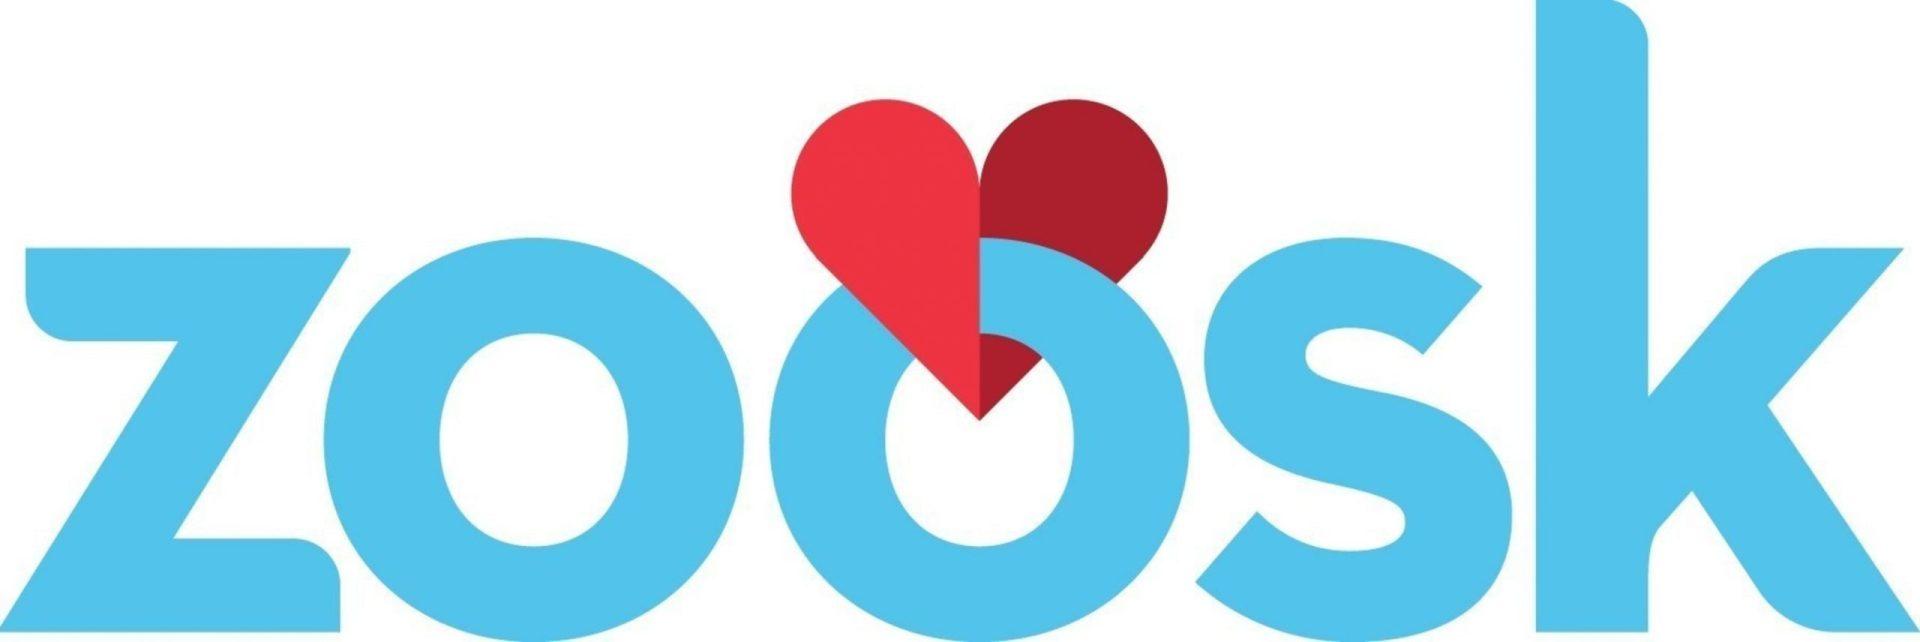 Zoosk Blue Logo